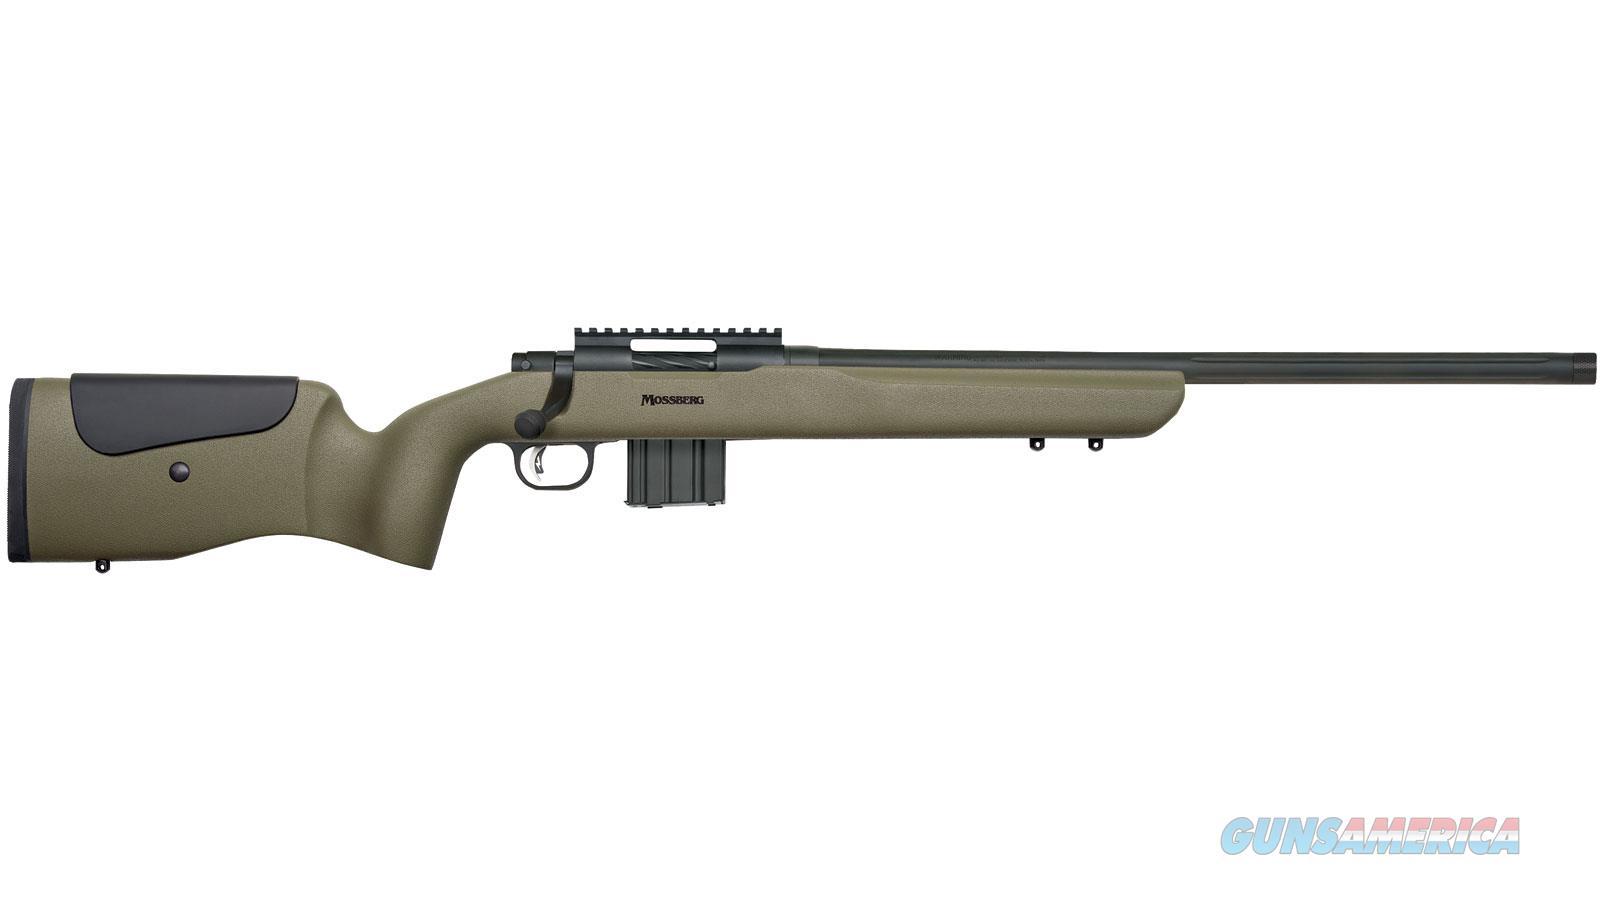 "Mossberg Mvp Lr 6.5Cred 22"" 11Rd 27784  Guns > Rifles > MN Misc Rifles"